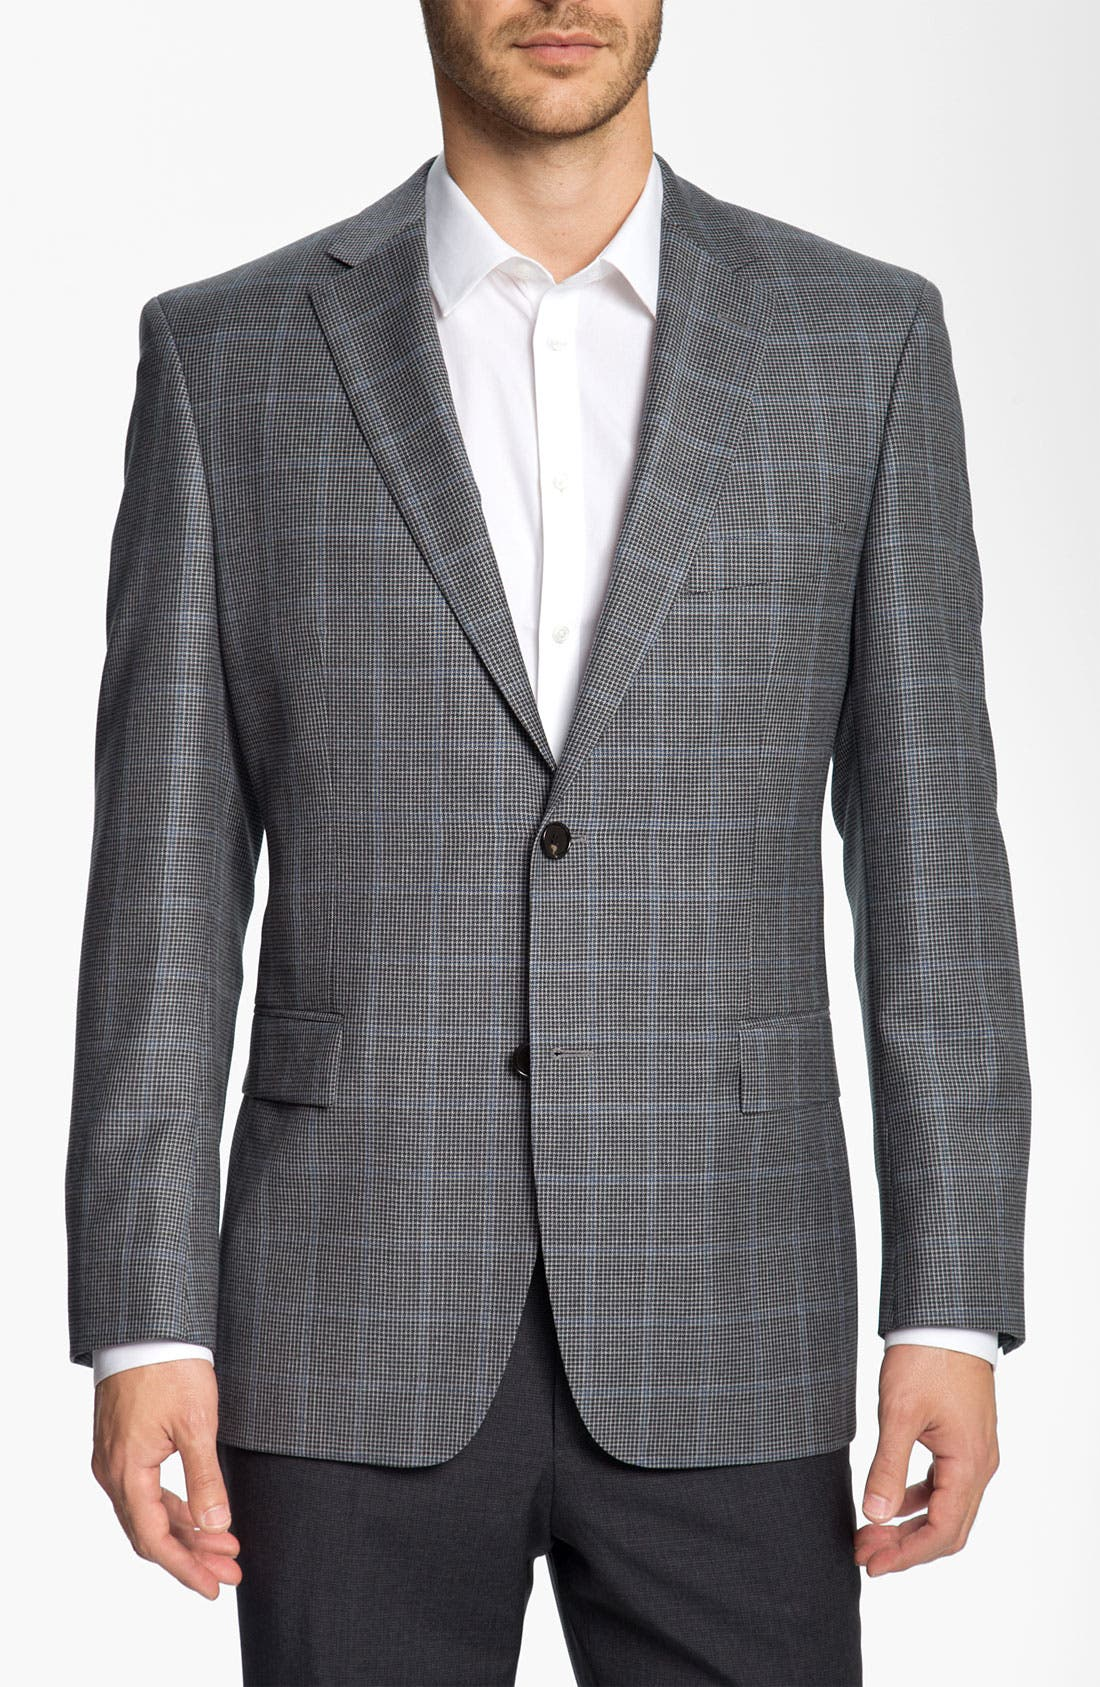 Alternate Image 1 Selected - BOSS Black 'Pasini' Houndstooth Sportcoat